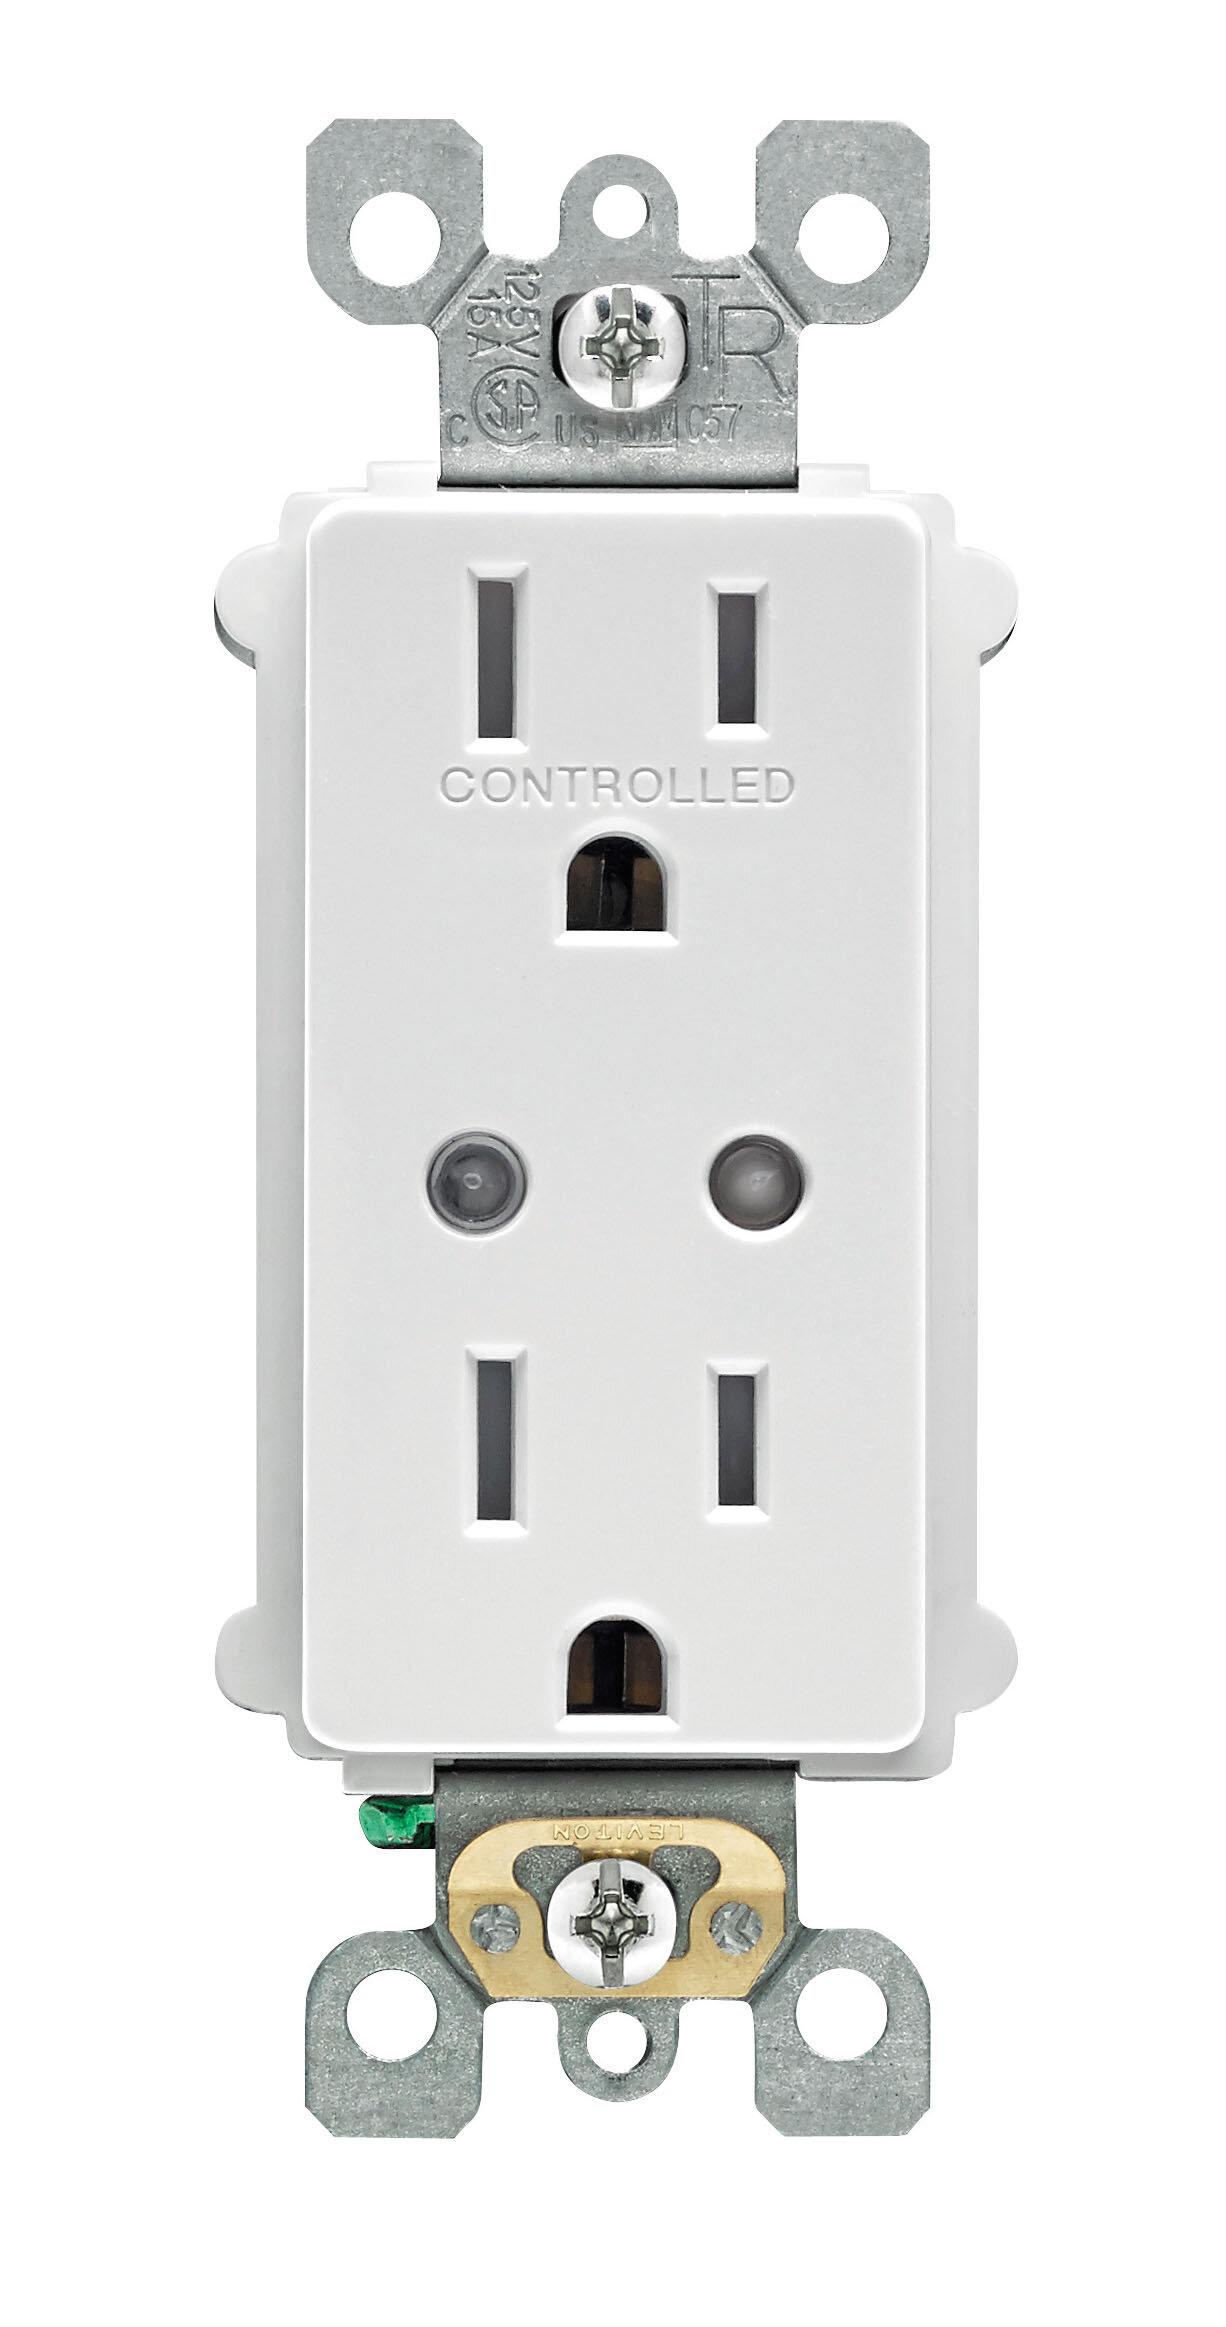 Leviton led night light outlet